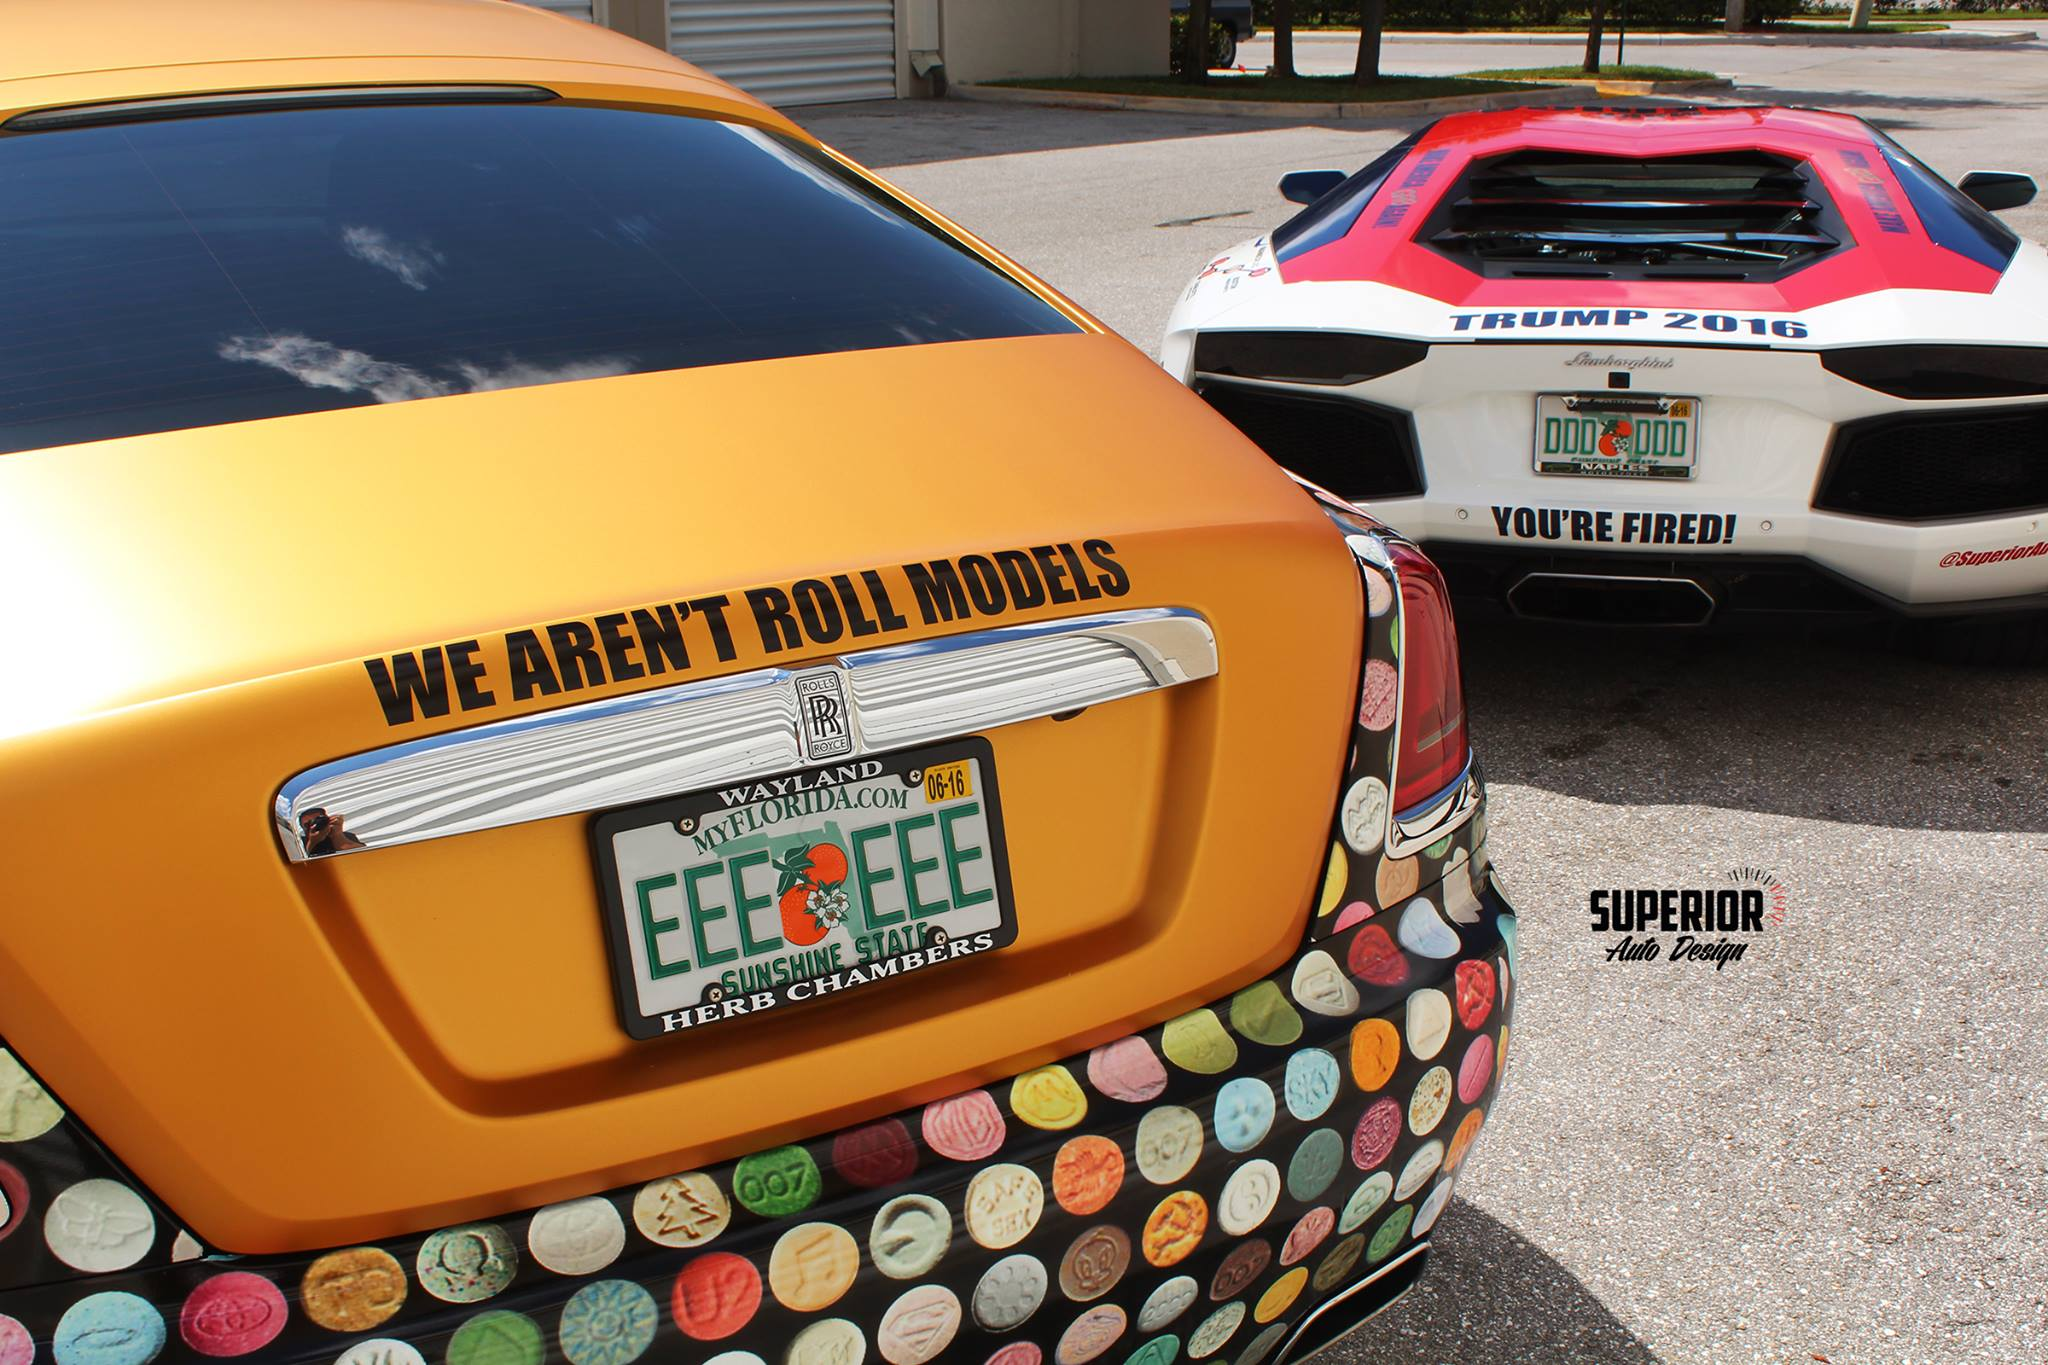 rolls-royce-goldrush-rally-superior-auto-design-5